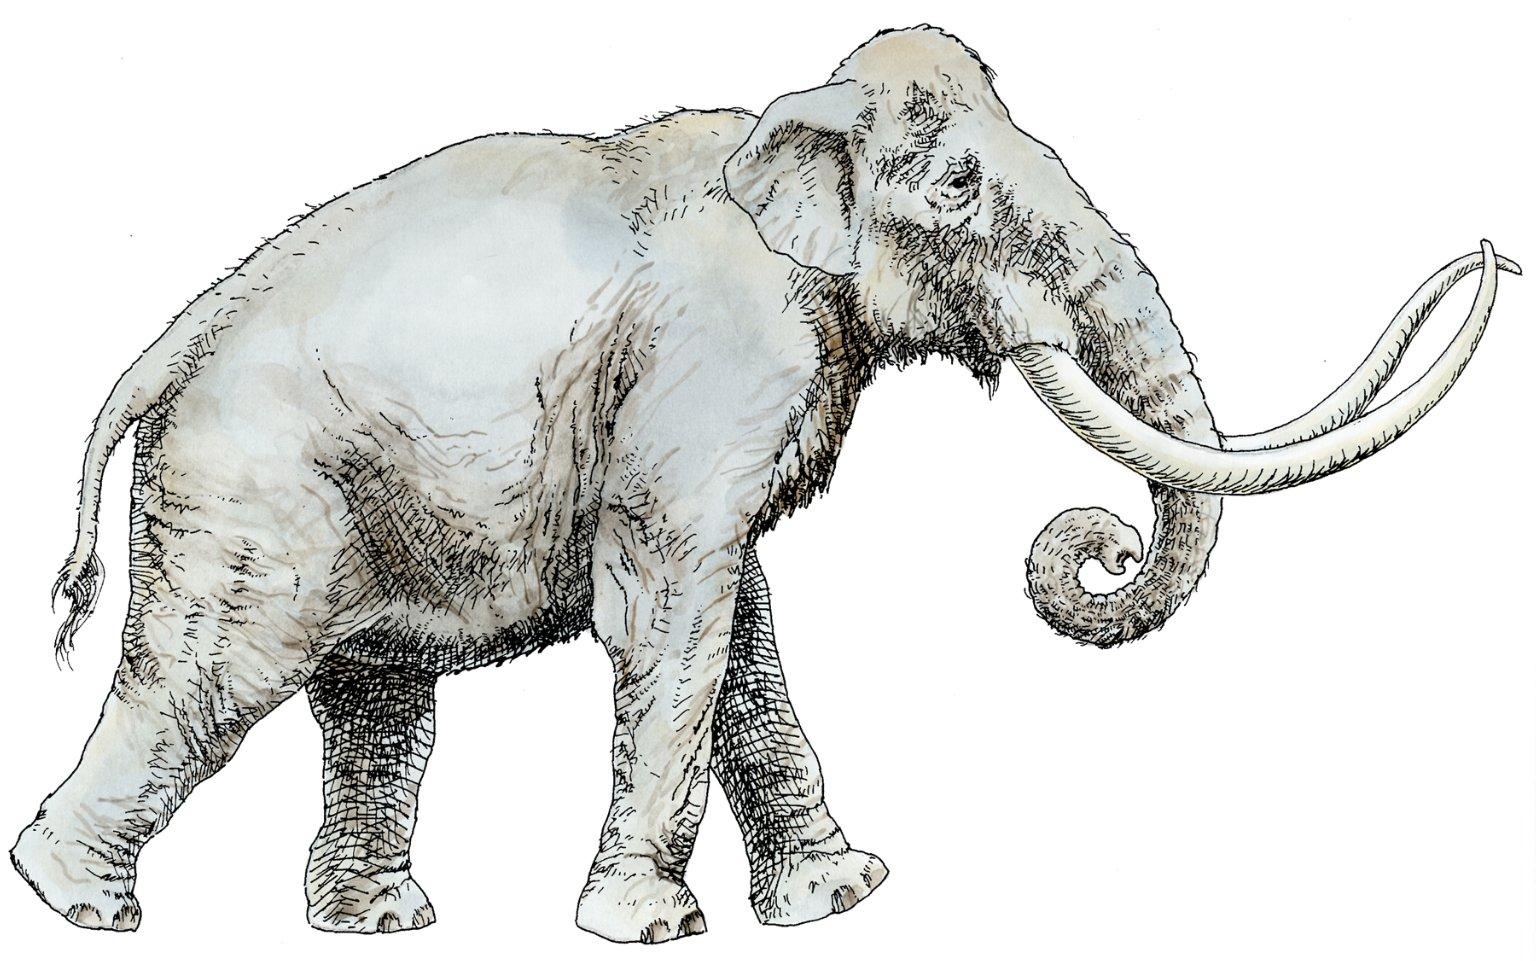 Columbian Mammoth, Ice Age Mammal